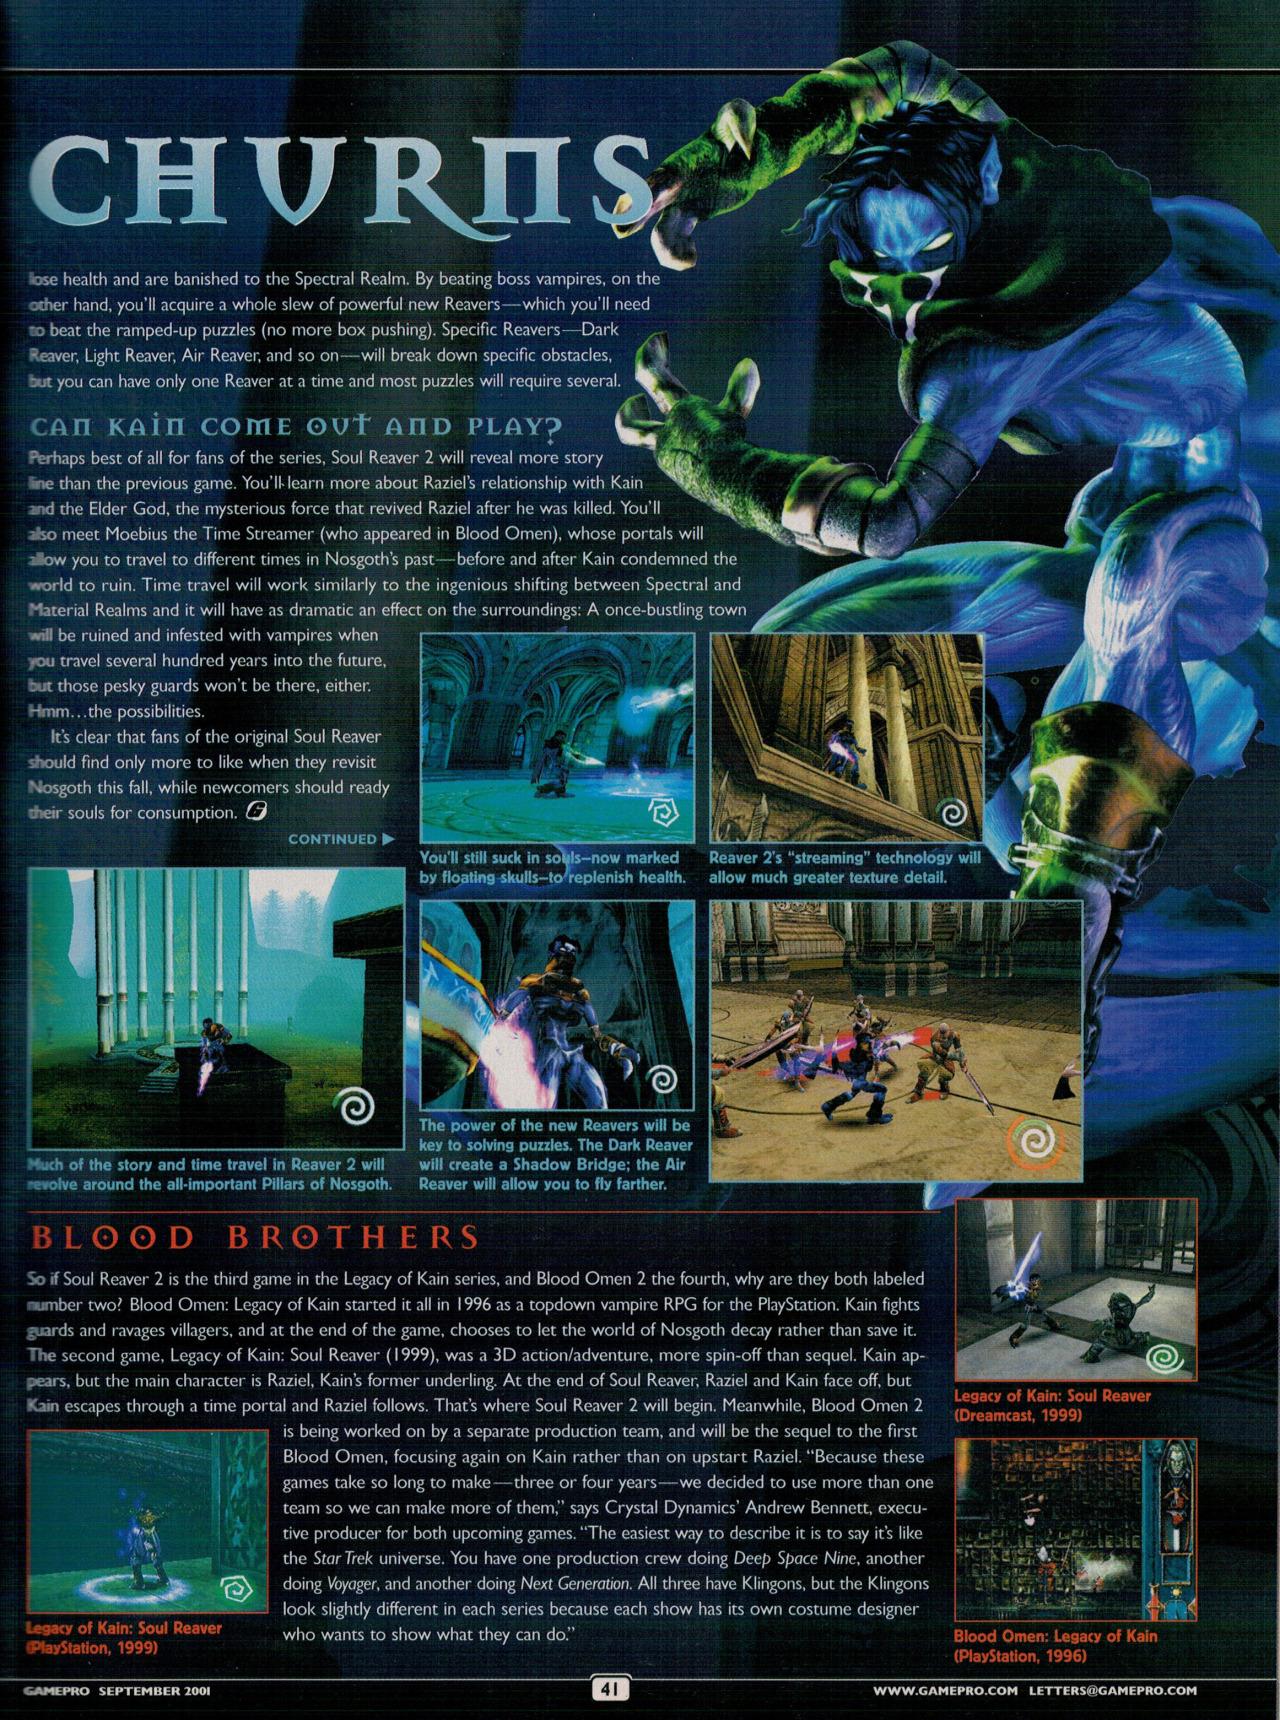 GamePro-71-5.jpg